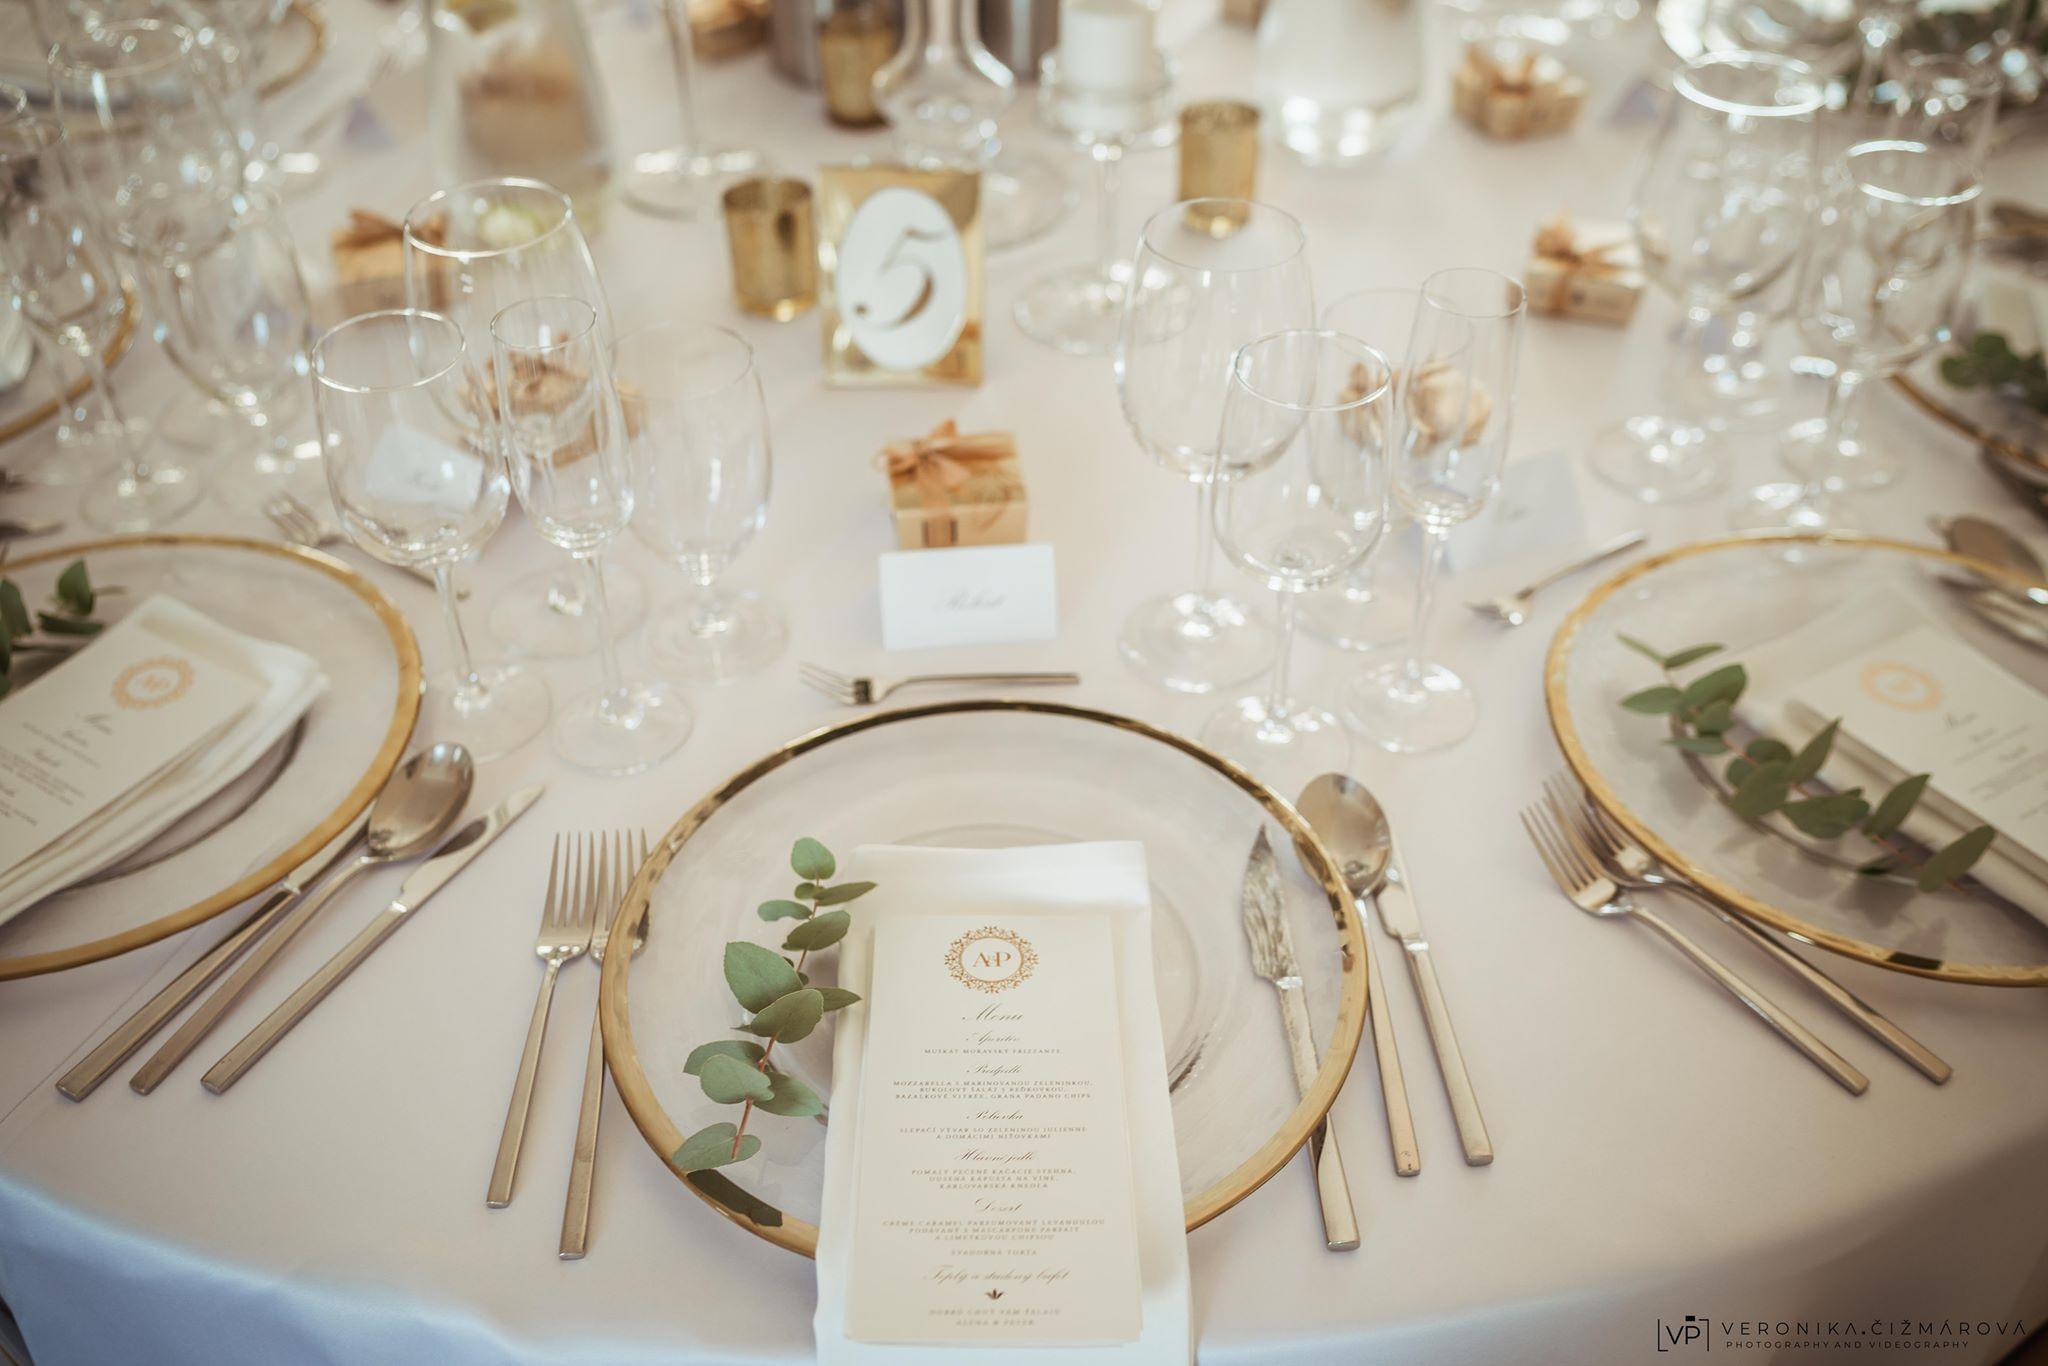 svadobna-hostina-jedlo-na-svadbujpg